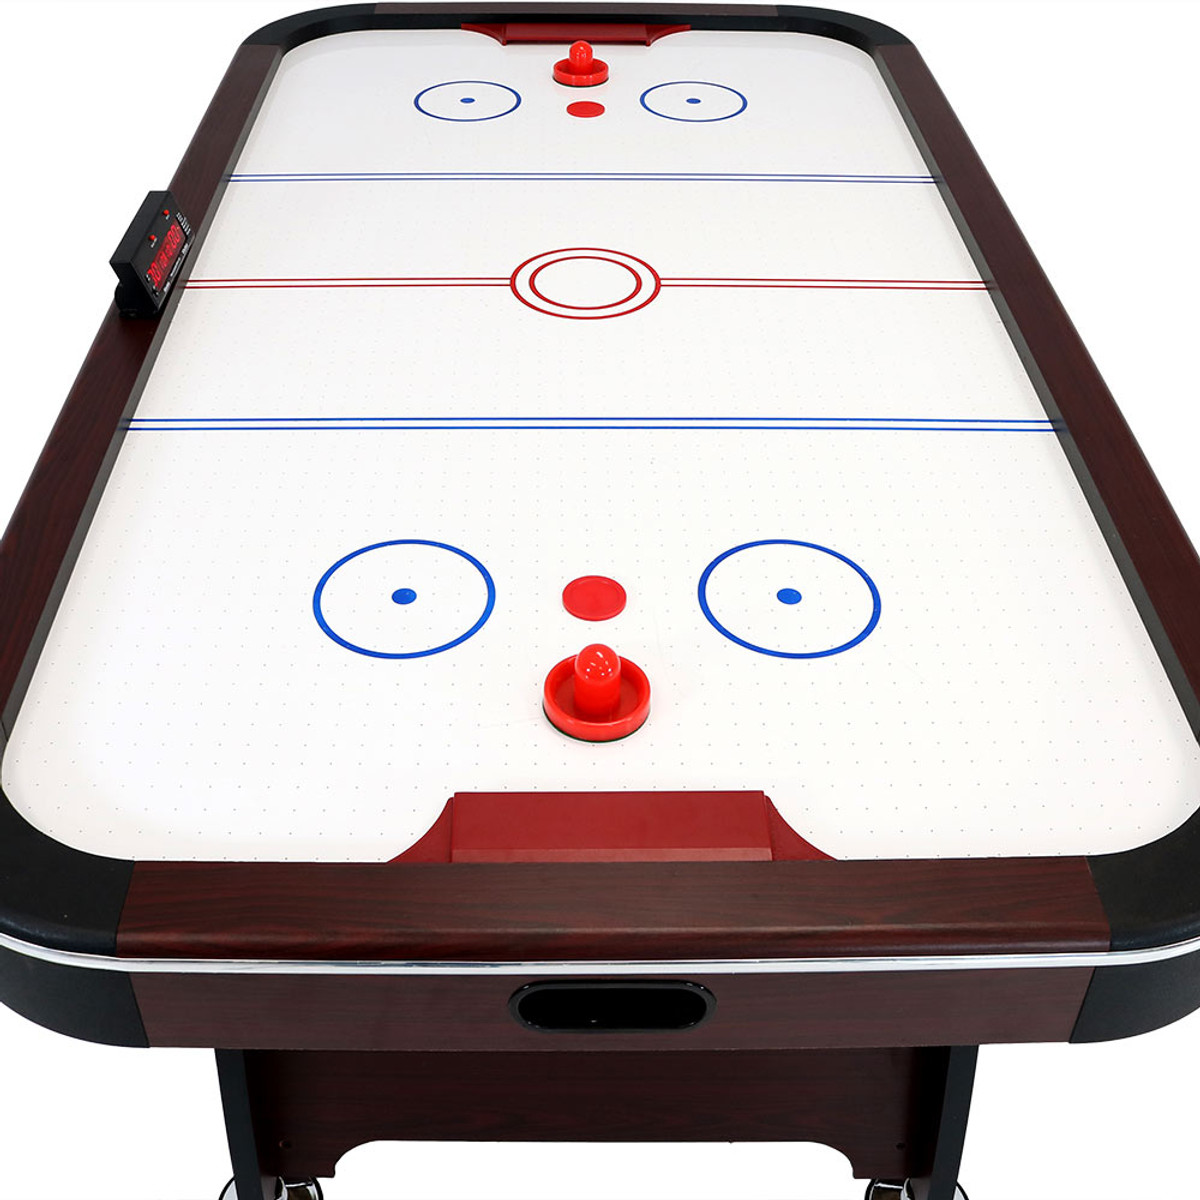 Sunnydaze 7 Foot Air Hockey Table With Scorer